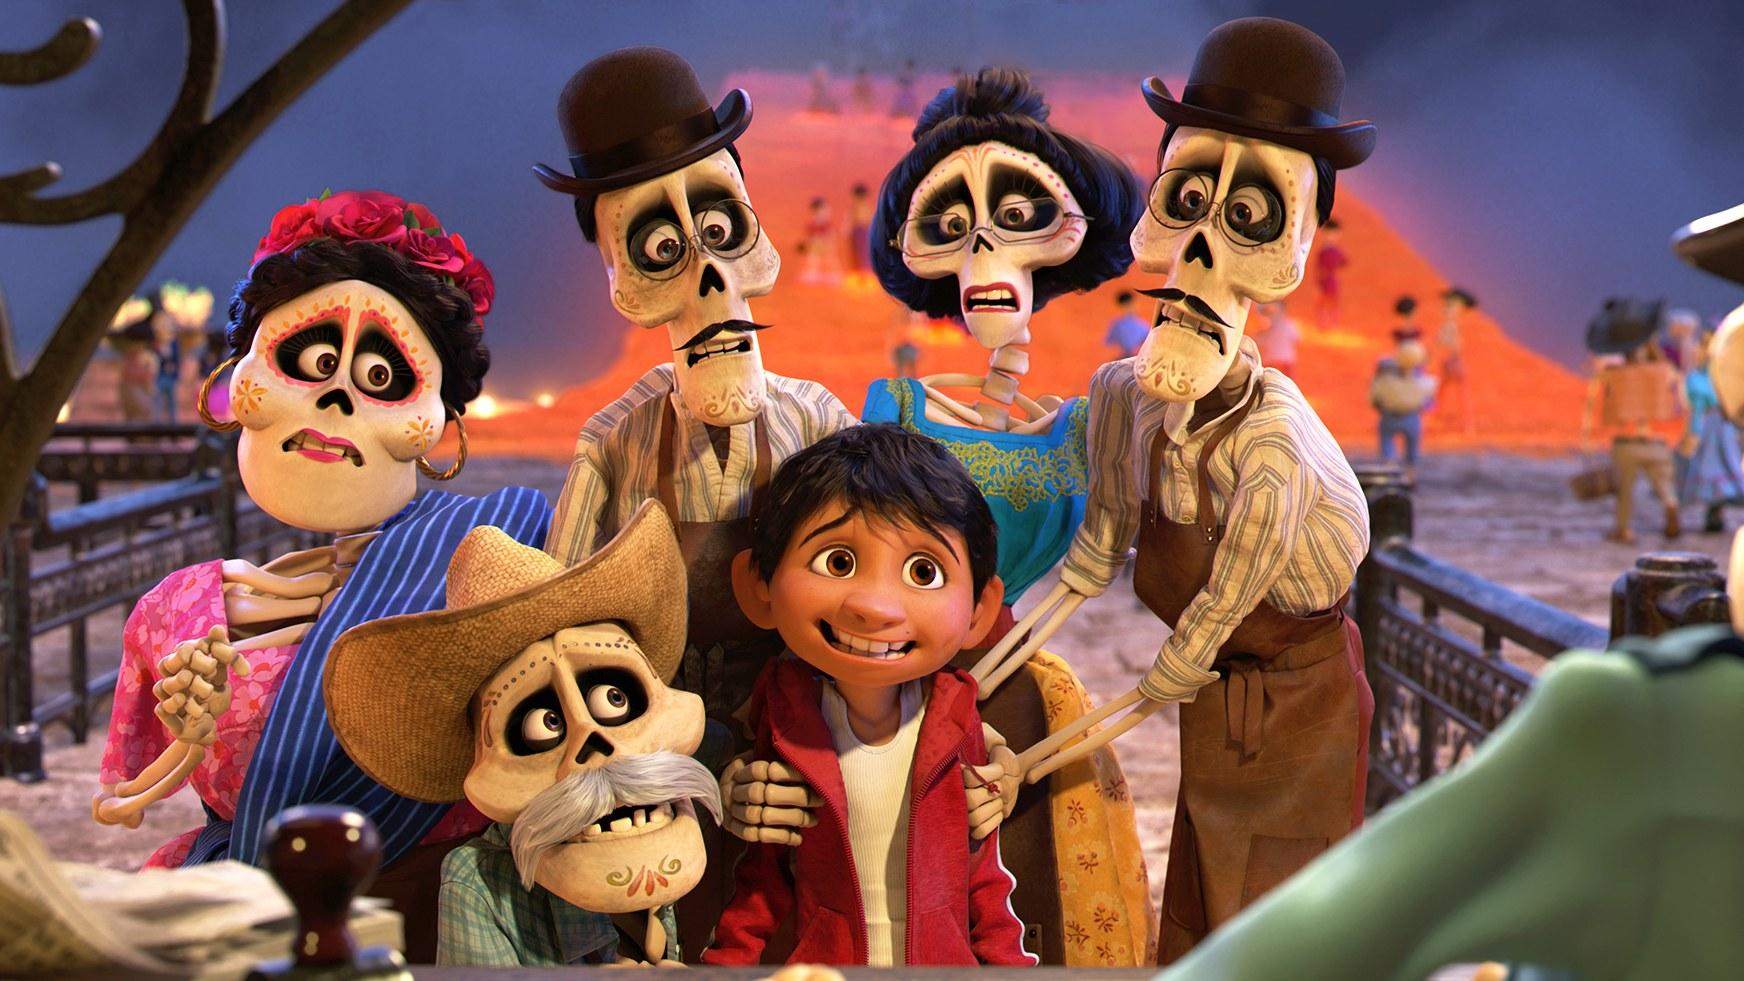 Coco Disney Pixar 2